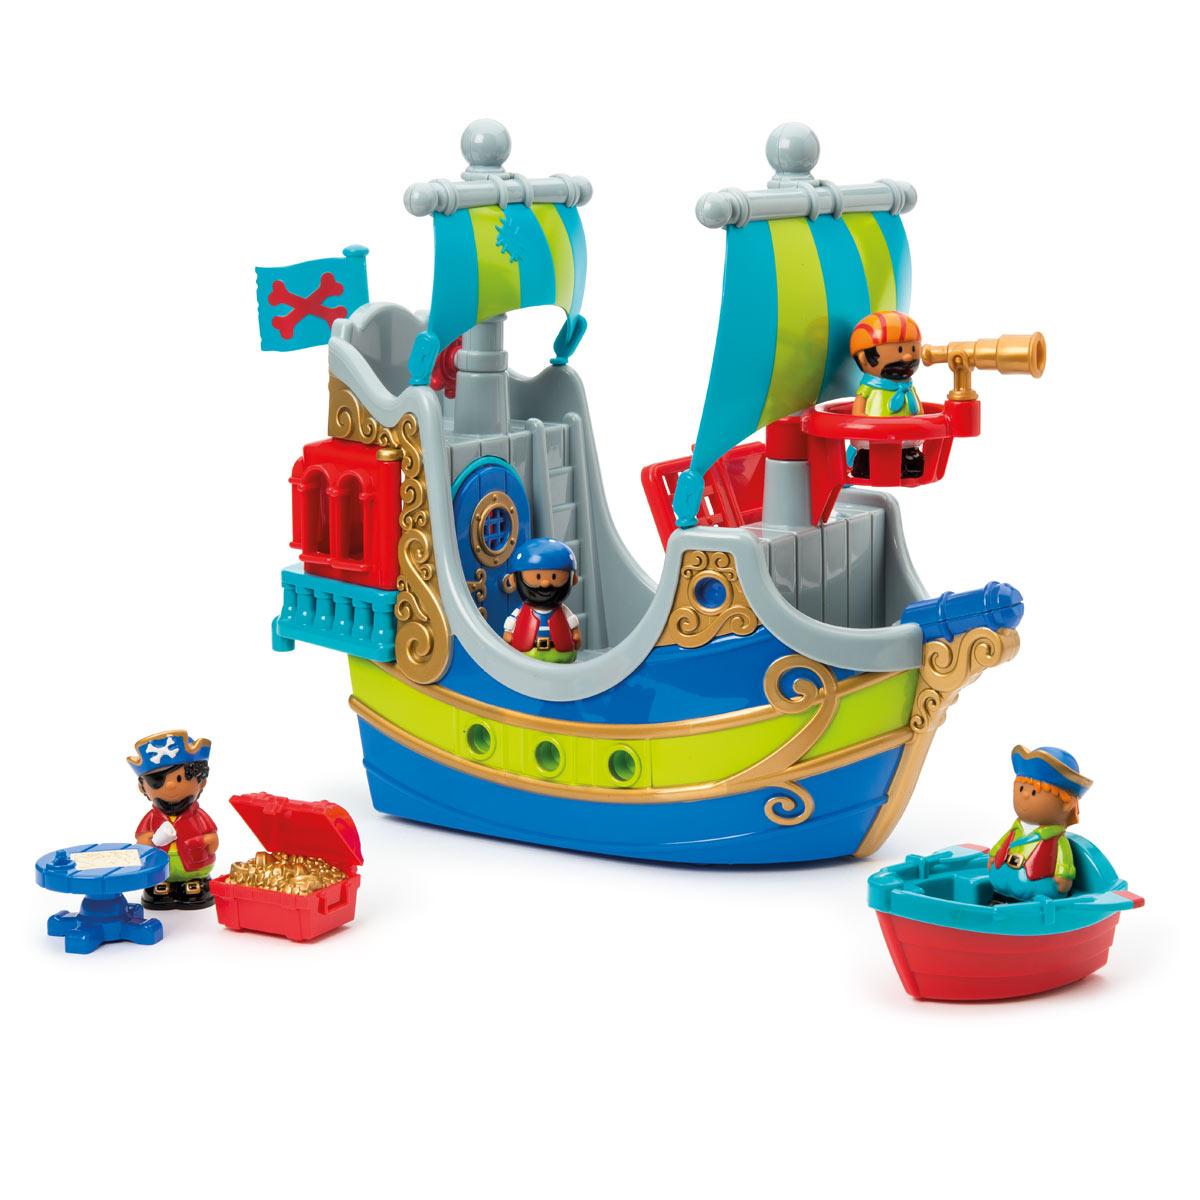 Bateau Pirate Happyland tout Jouet 2 Ans Garçon